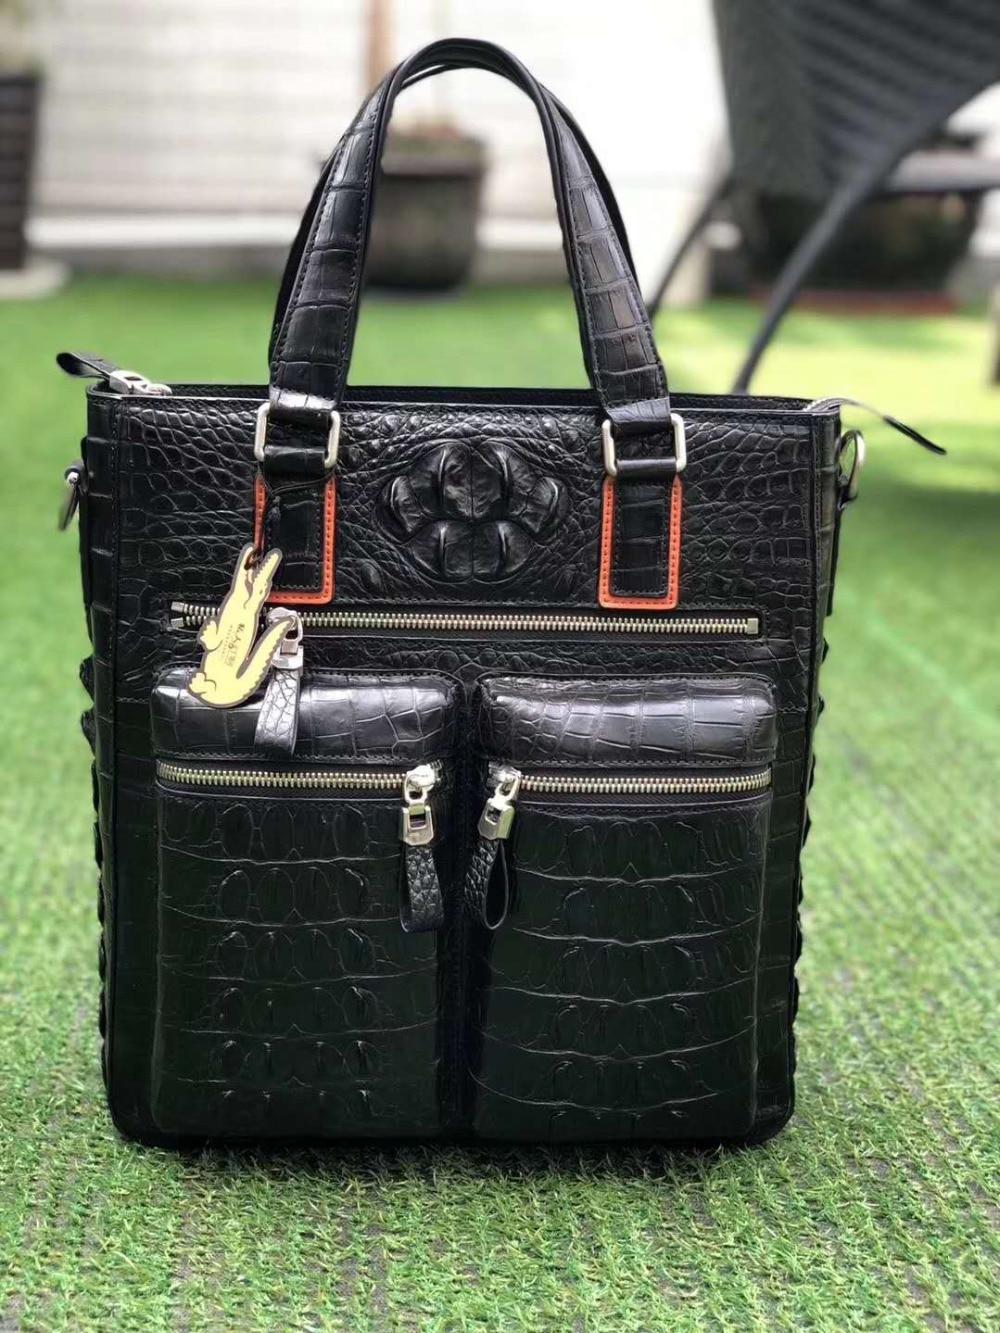 2018 Fashion Men's Genuine/Real 100% Crocodile Skin Briefcase Laptop Bag, Crocodile Skin Business Men Bag Fashion Business Bag